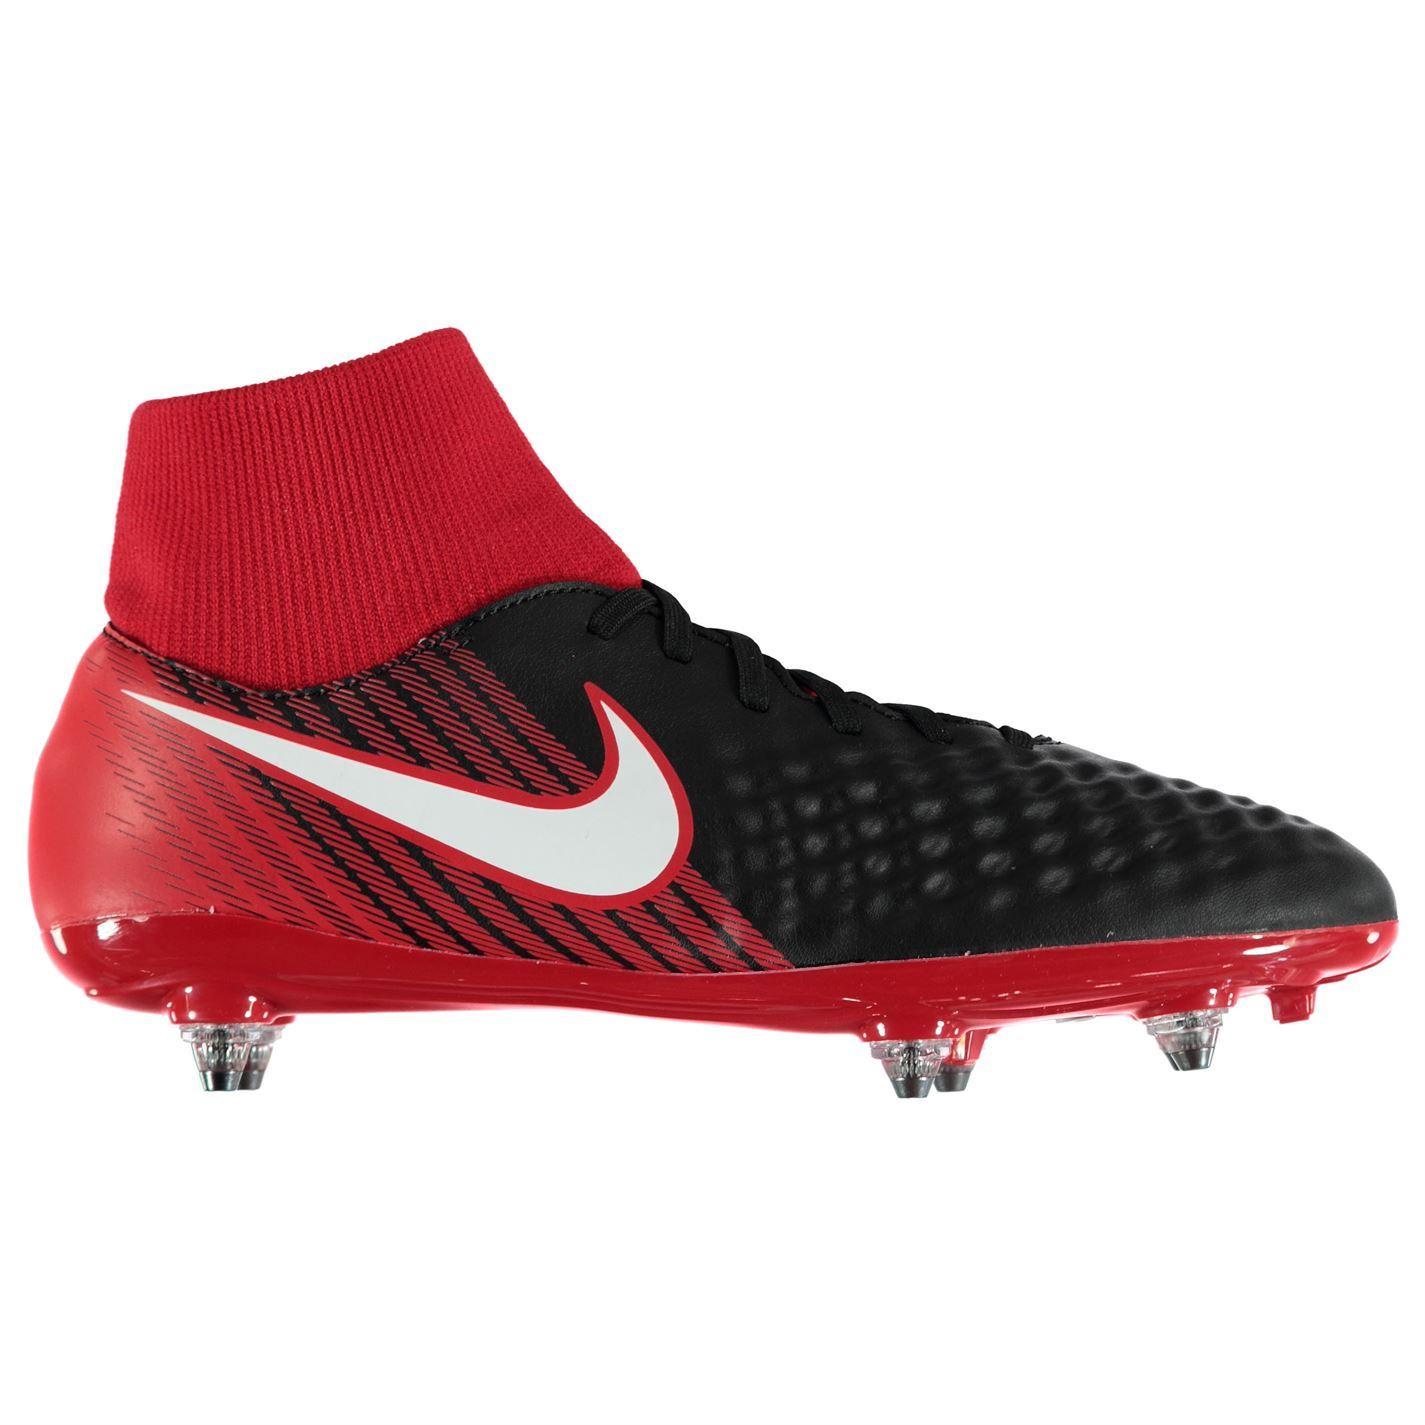 cc591e6f8c7 ... Nike Magista Onda DF Soft Ground Football Boots Mens Black Soccer Shoes  Cleats ...